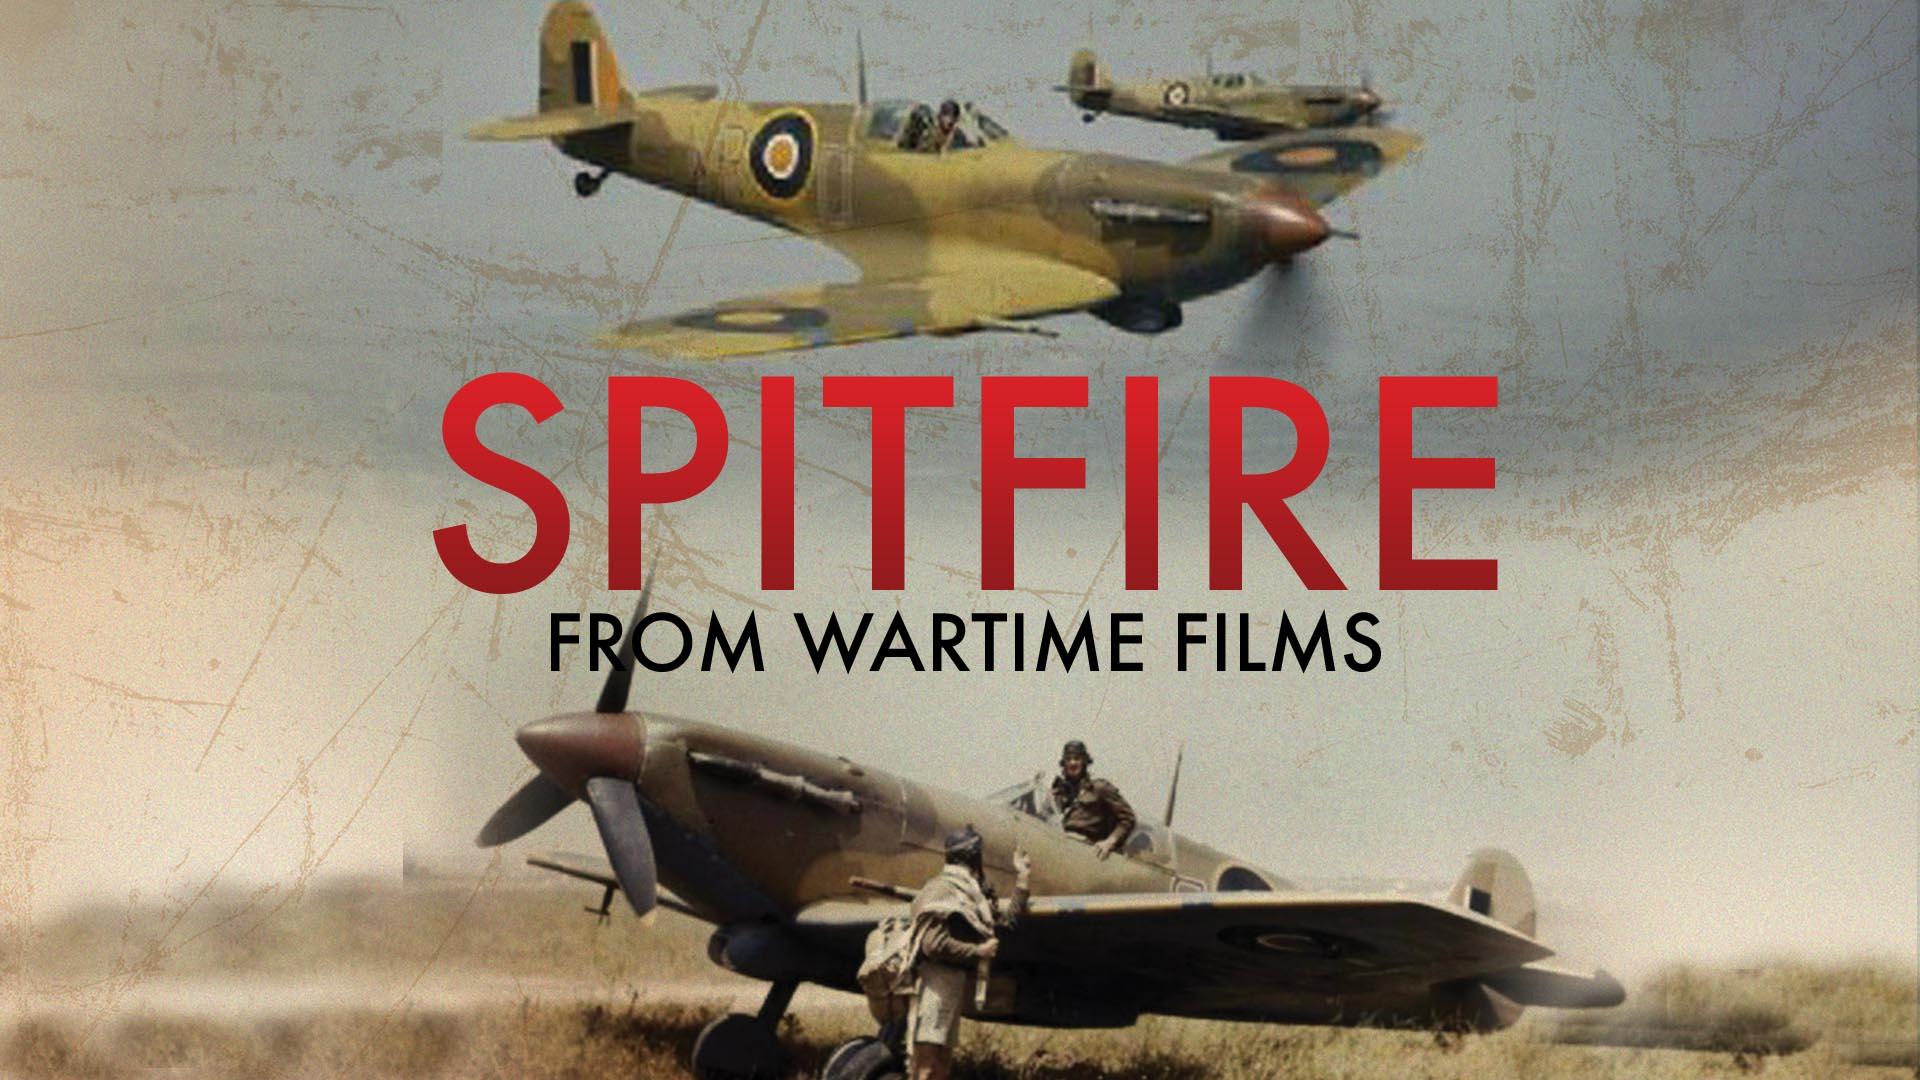 Spitfire From Wartime Films -